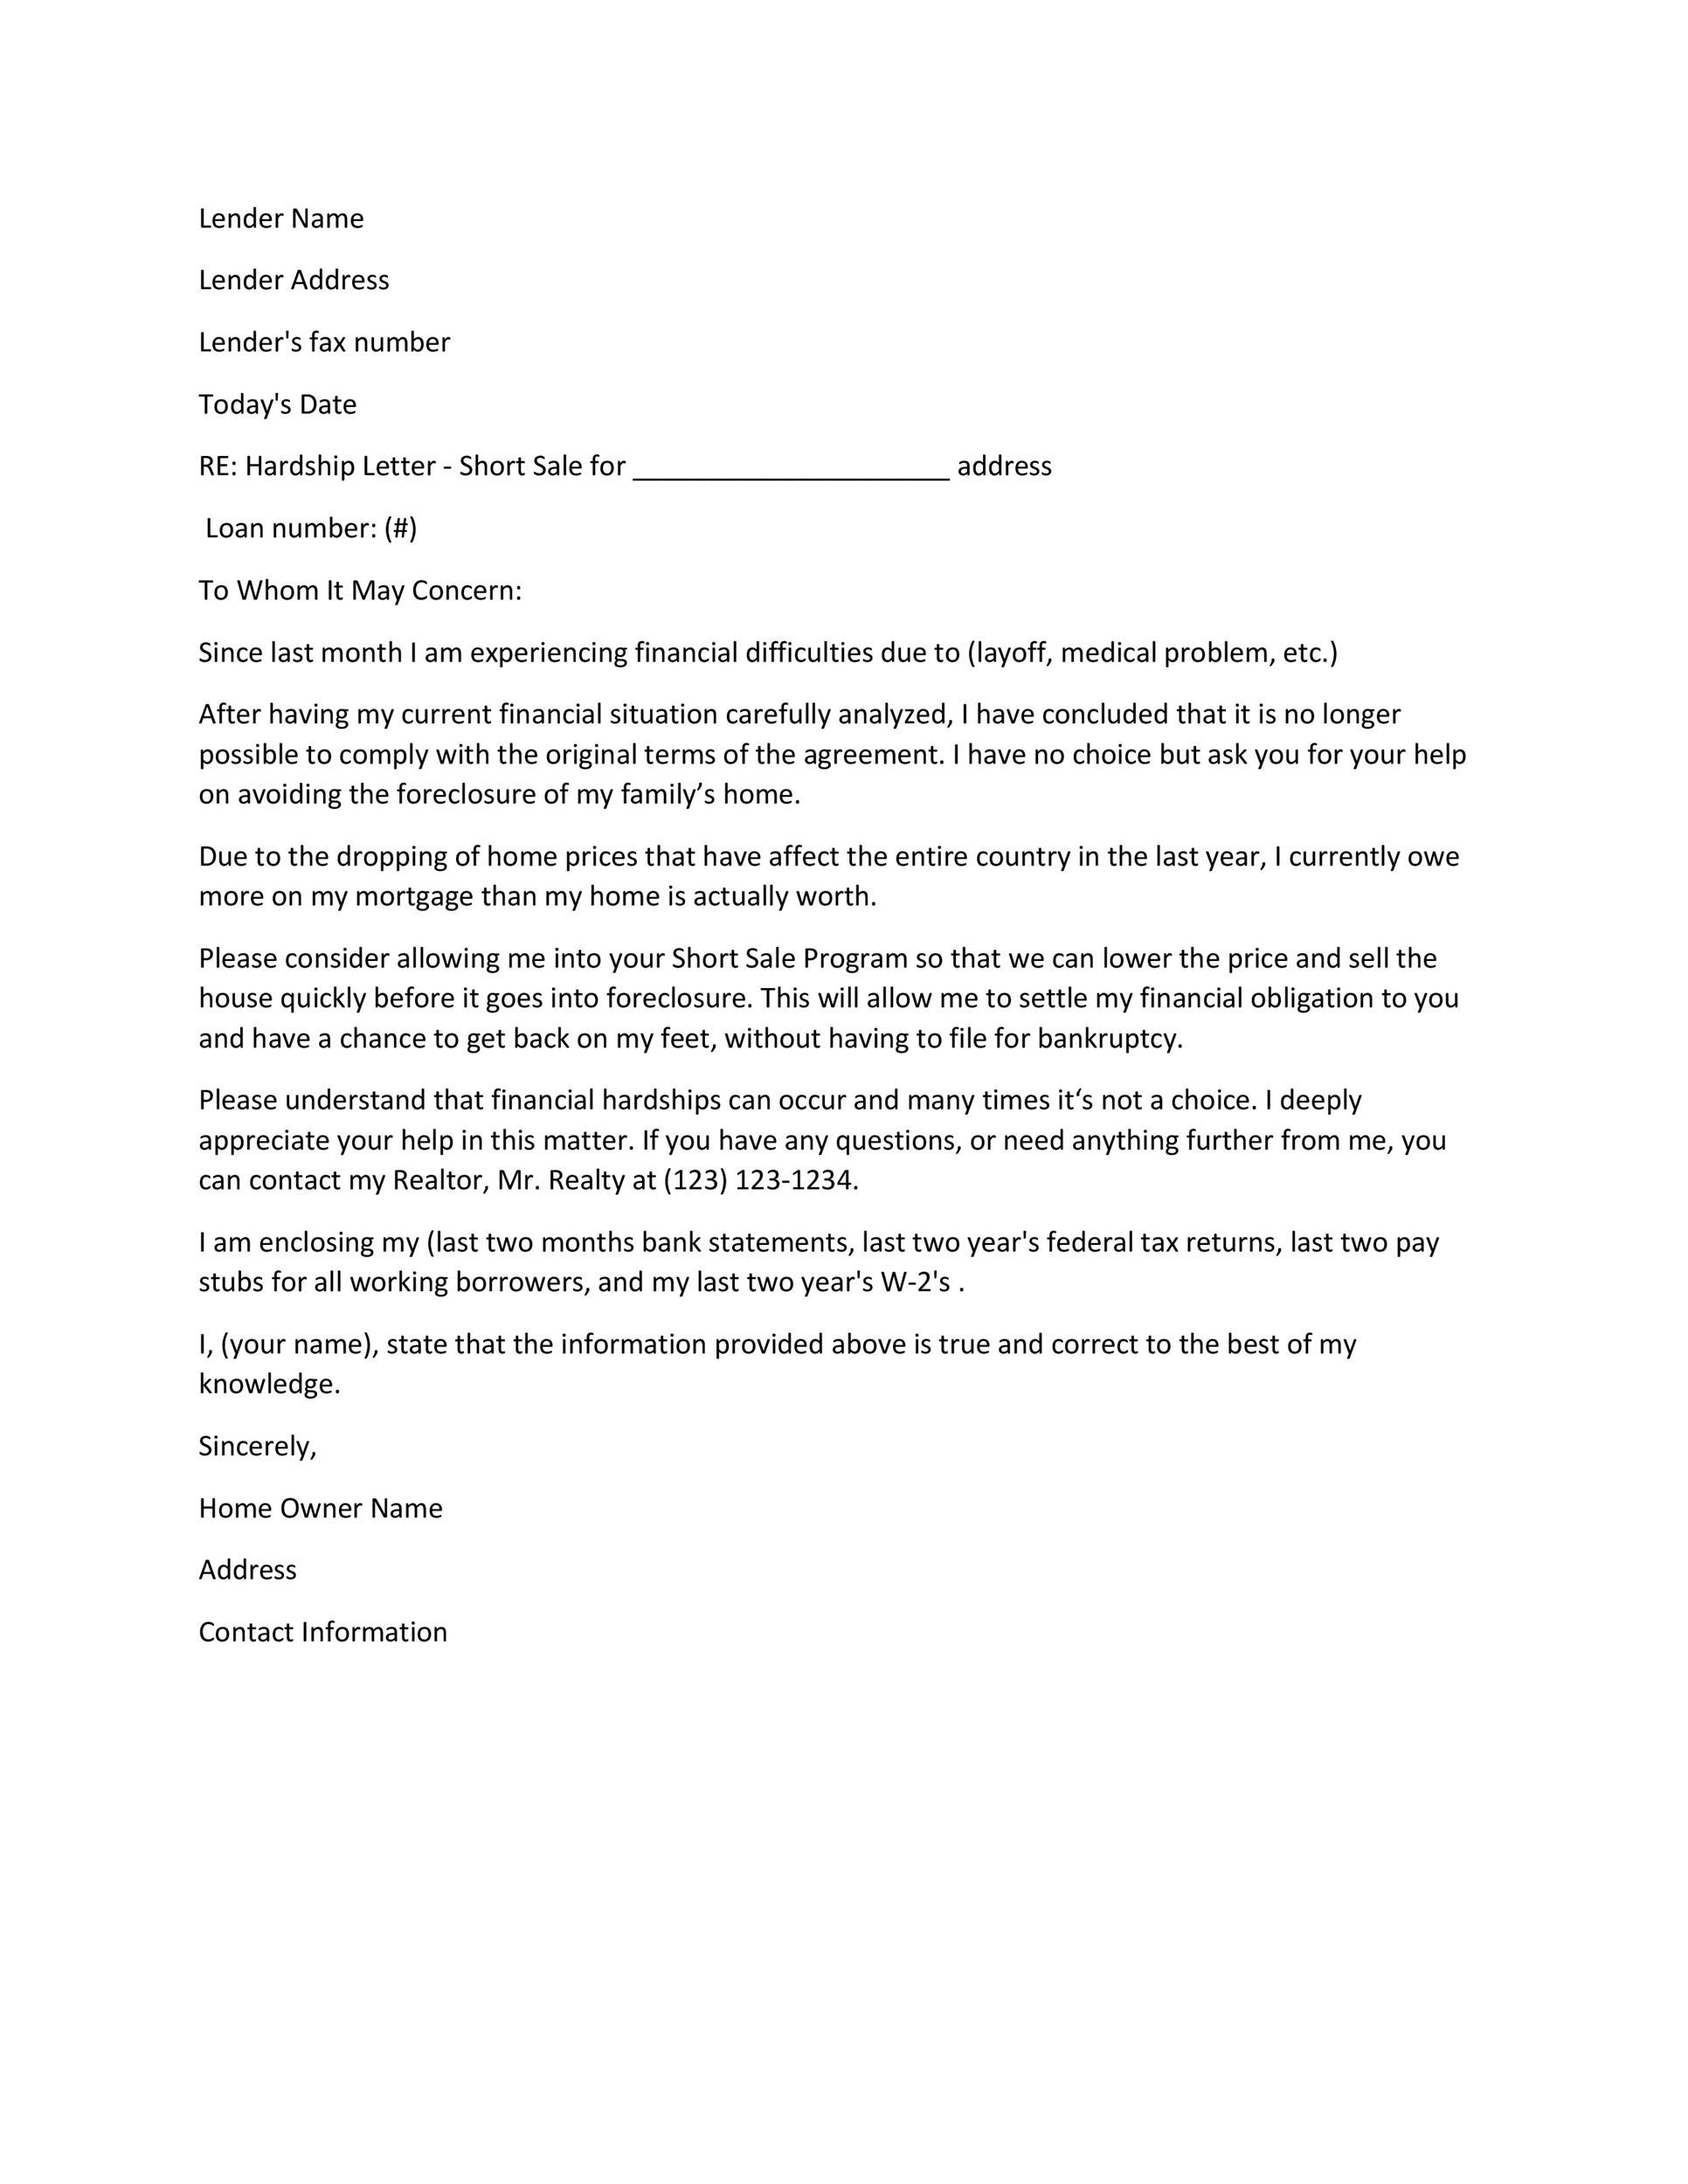 Calfresh Notice Expiration Certification